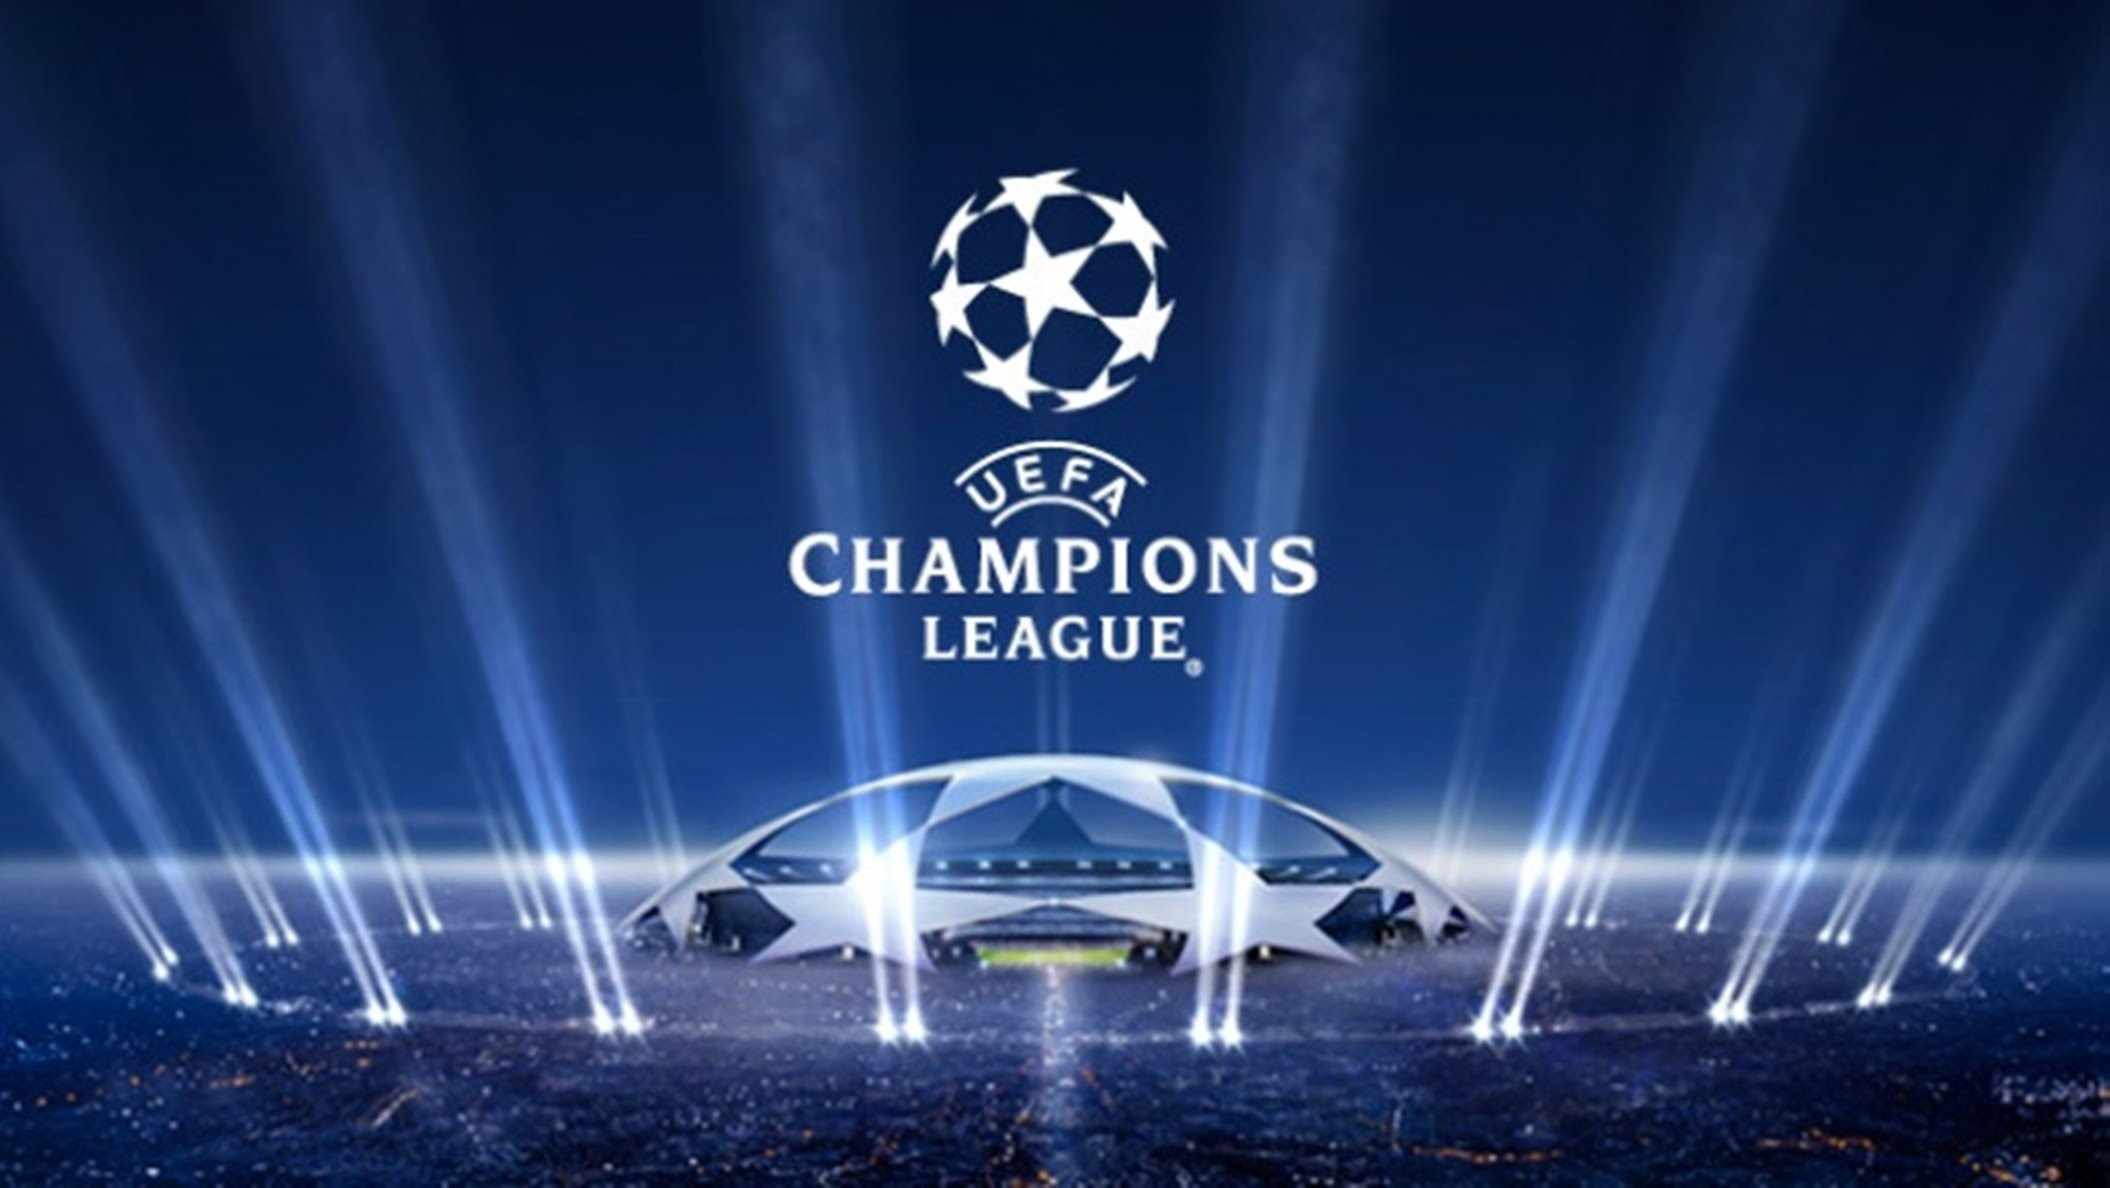 La Juventus sogna l'impresa in Champions League